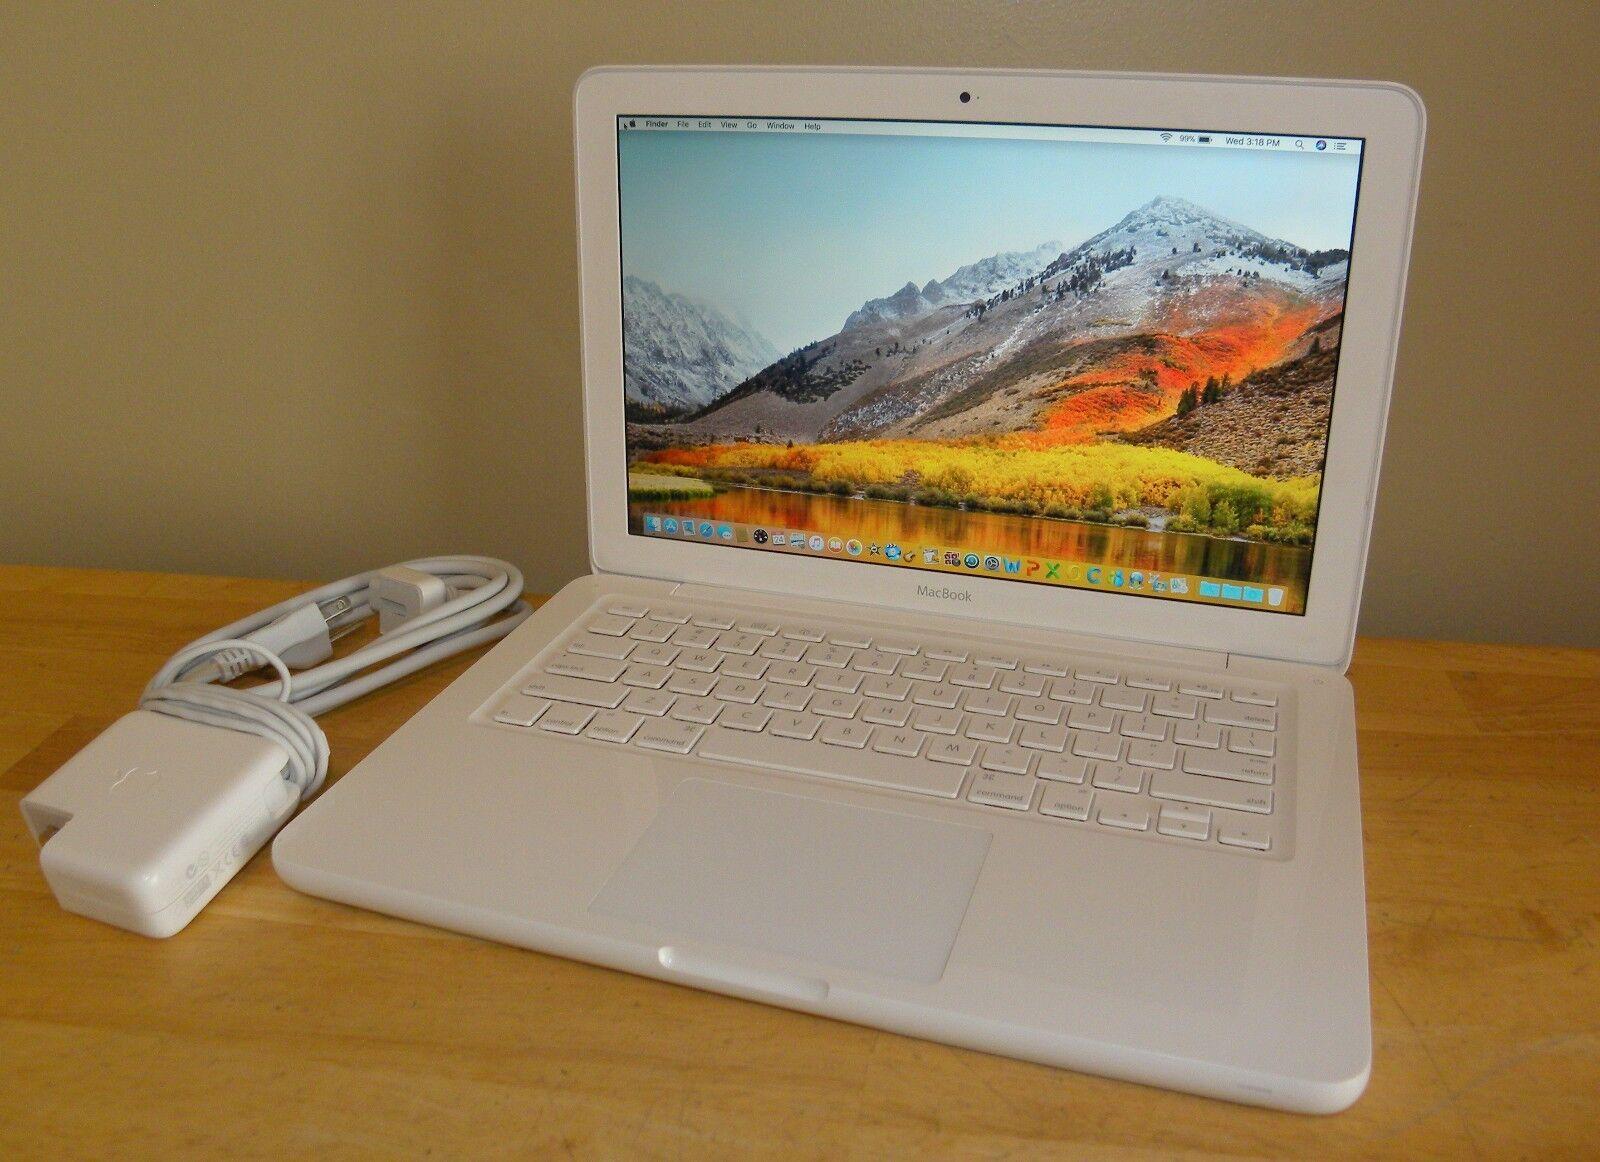 "Macbook - Apple Macbook 13"" A1342 Mid 2010 2.4GHz 250GB 4GB 10.13 High Sierra Office"